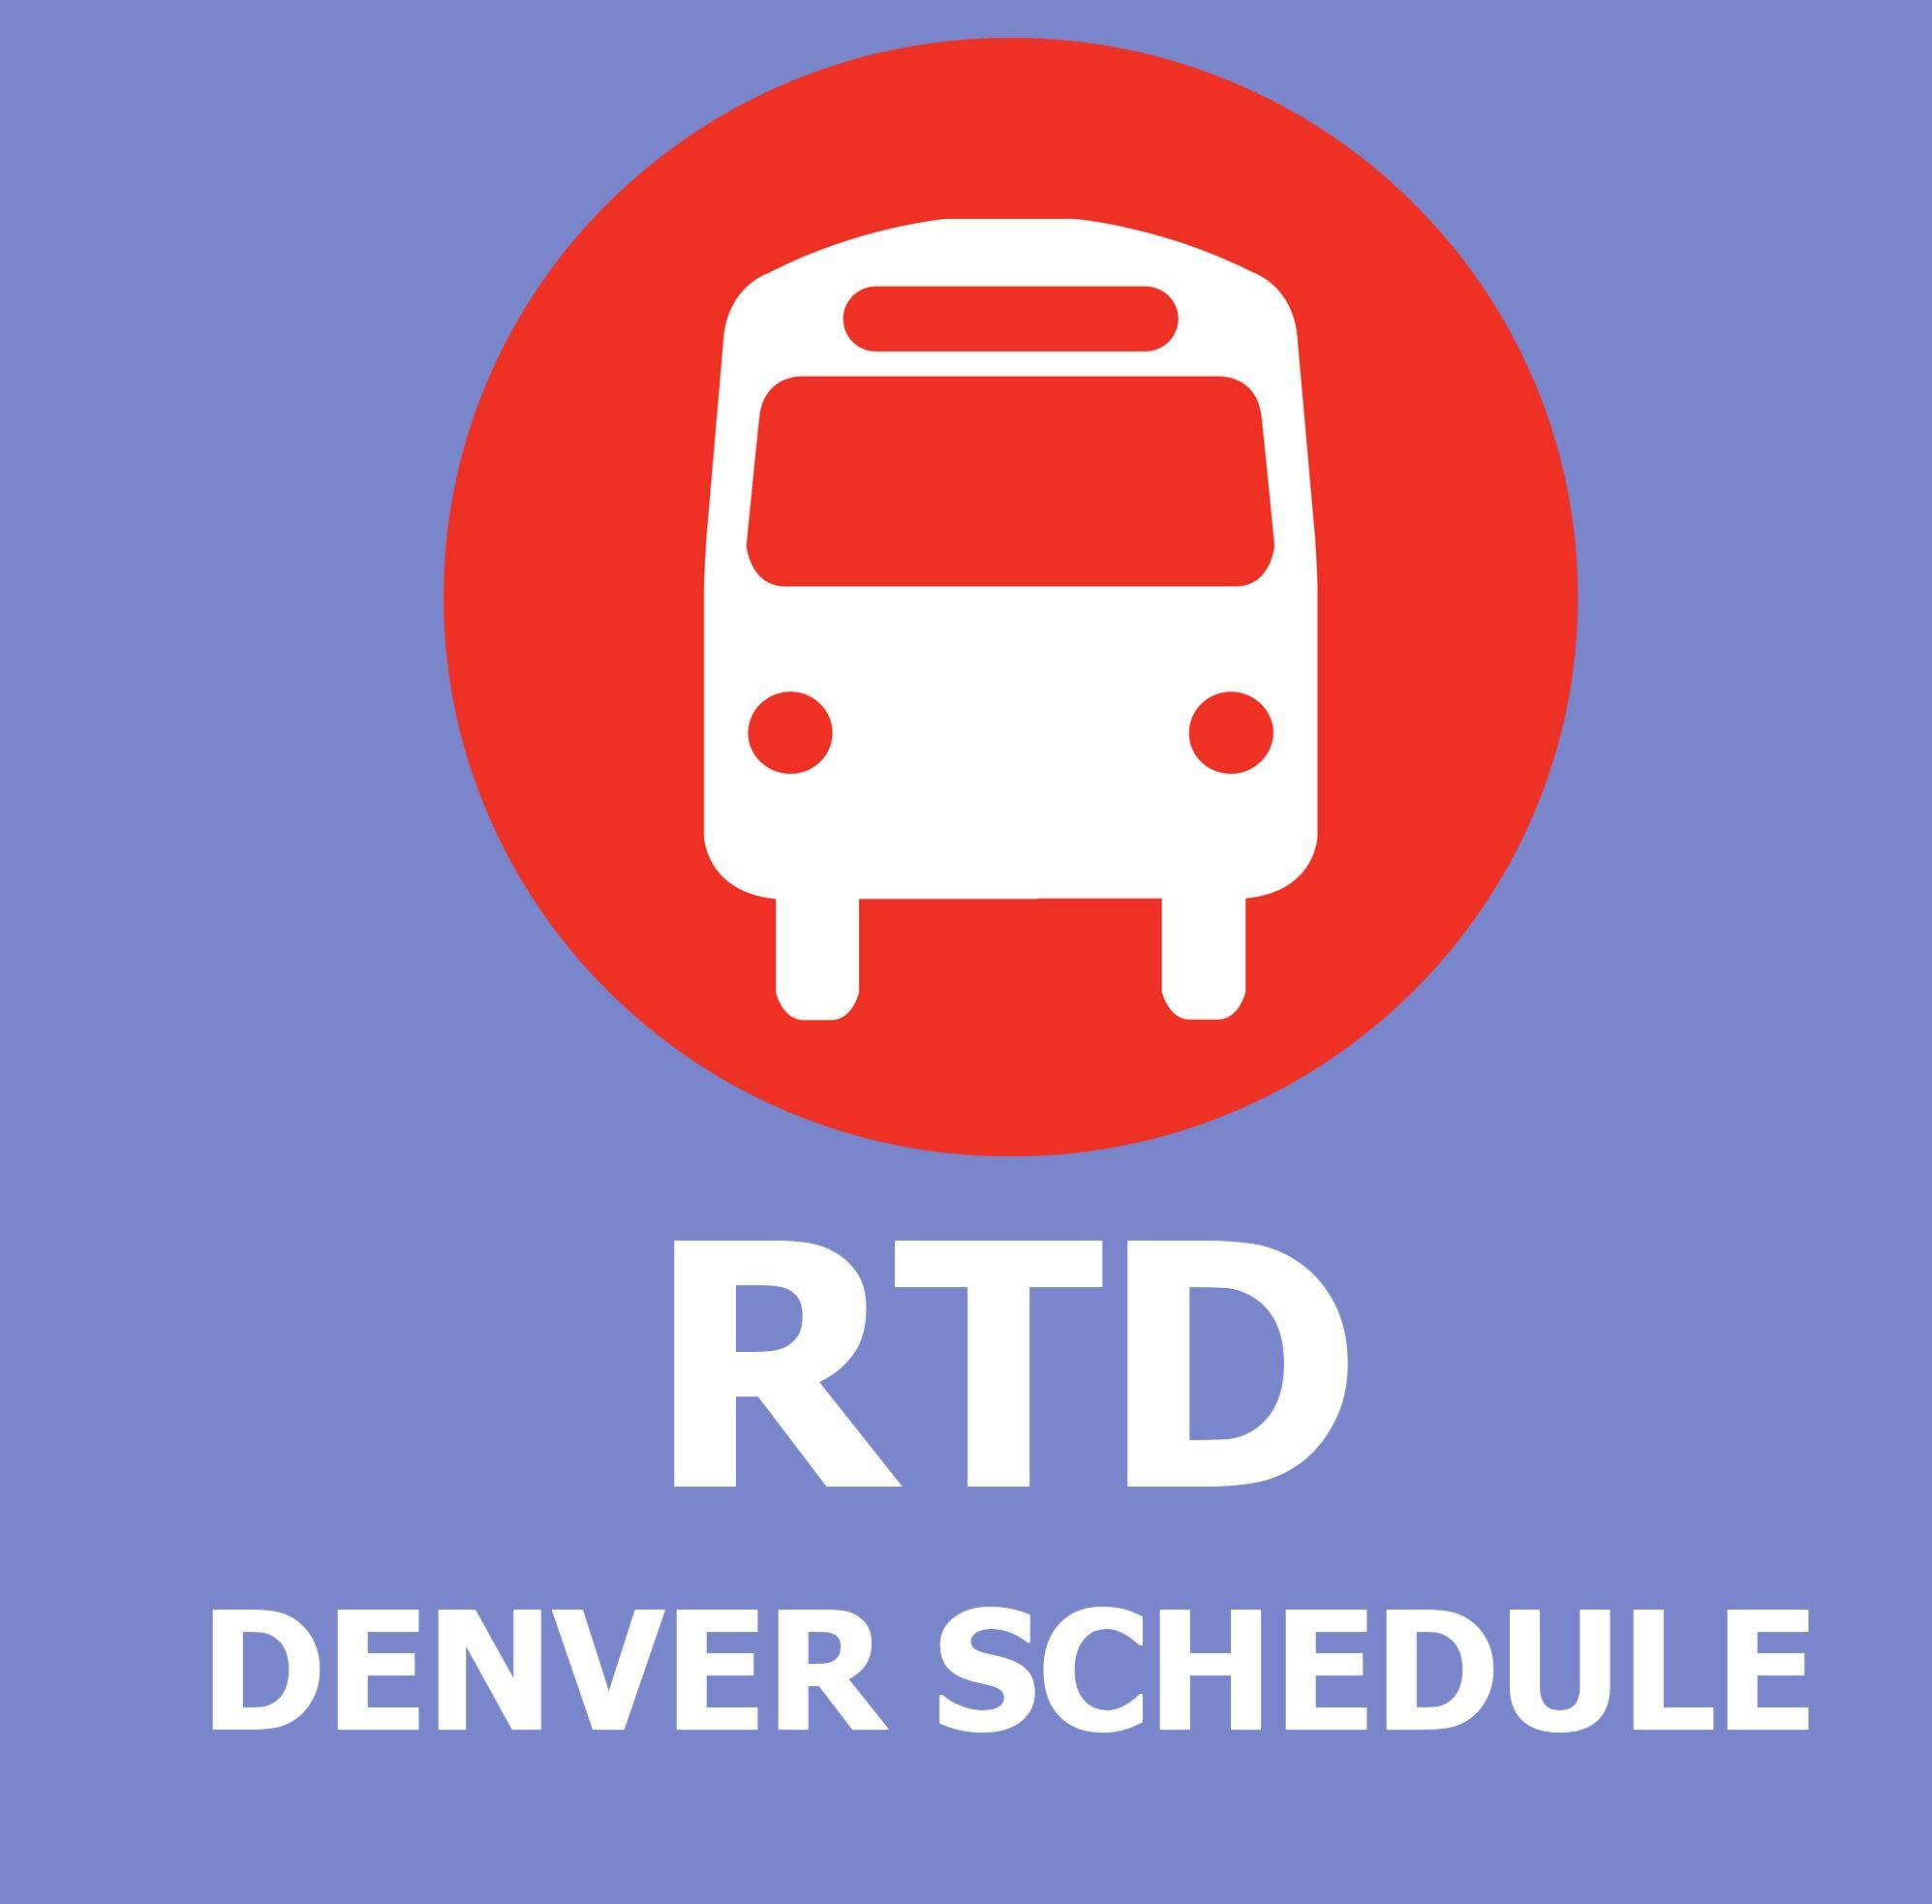 RTD Denver Schedule for Android - APK Download